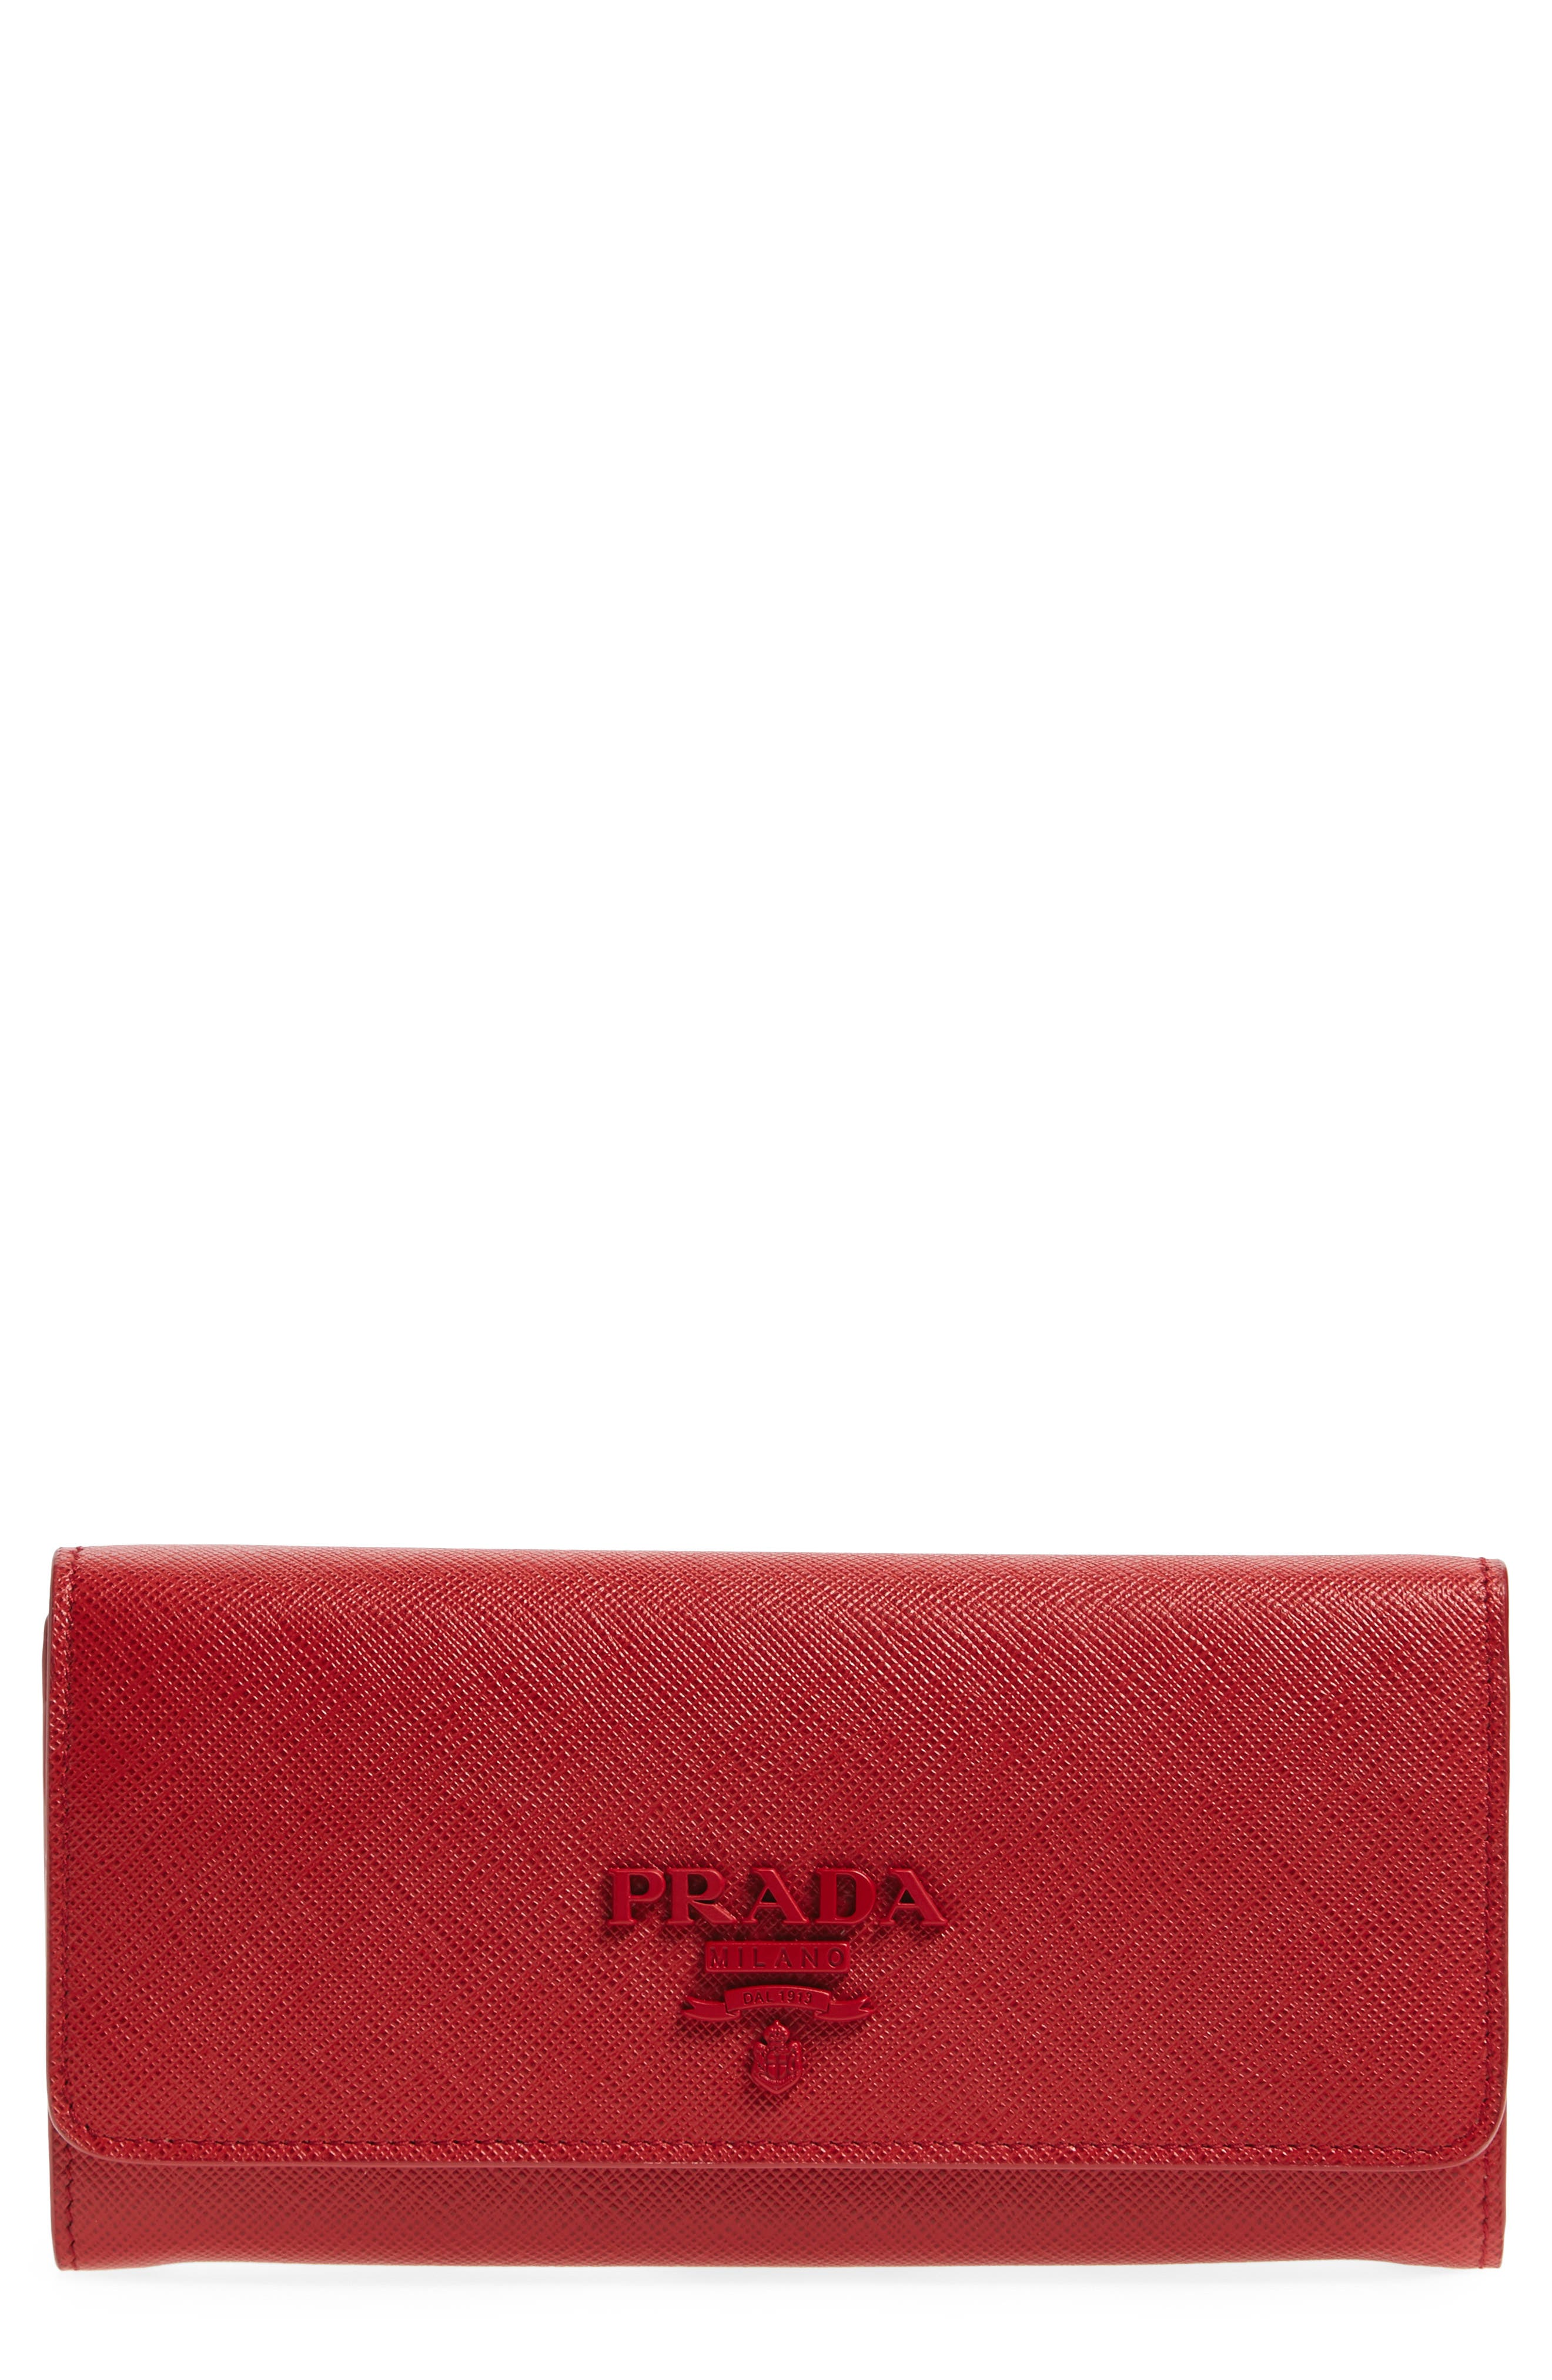 Main Image - Prada Saffiano Leather Wallet